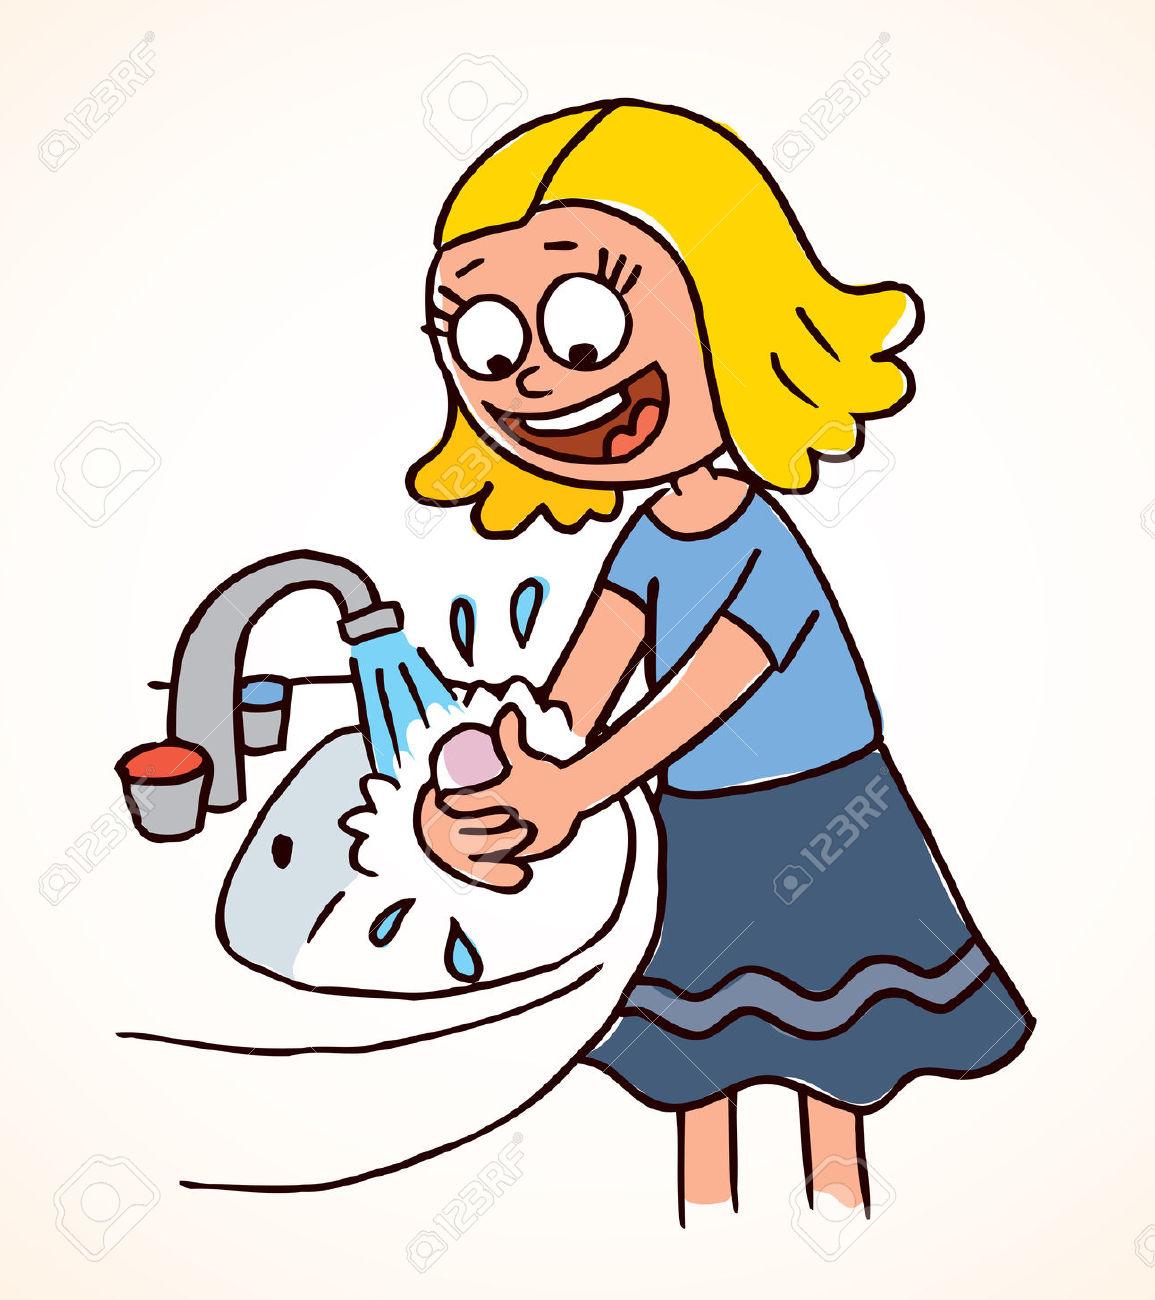 Little Girl Washing Hands .-little girl washing hands .-9